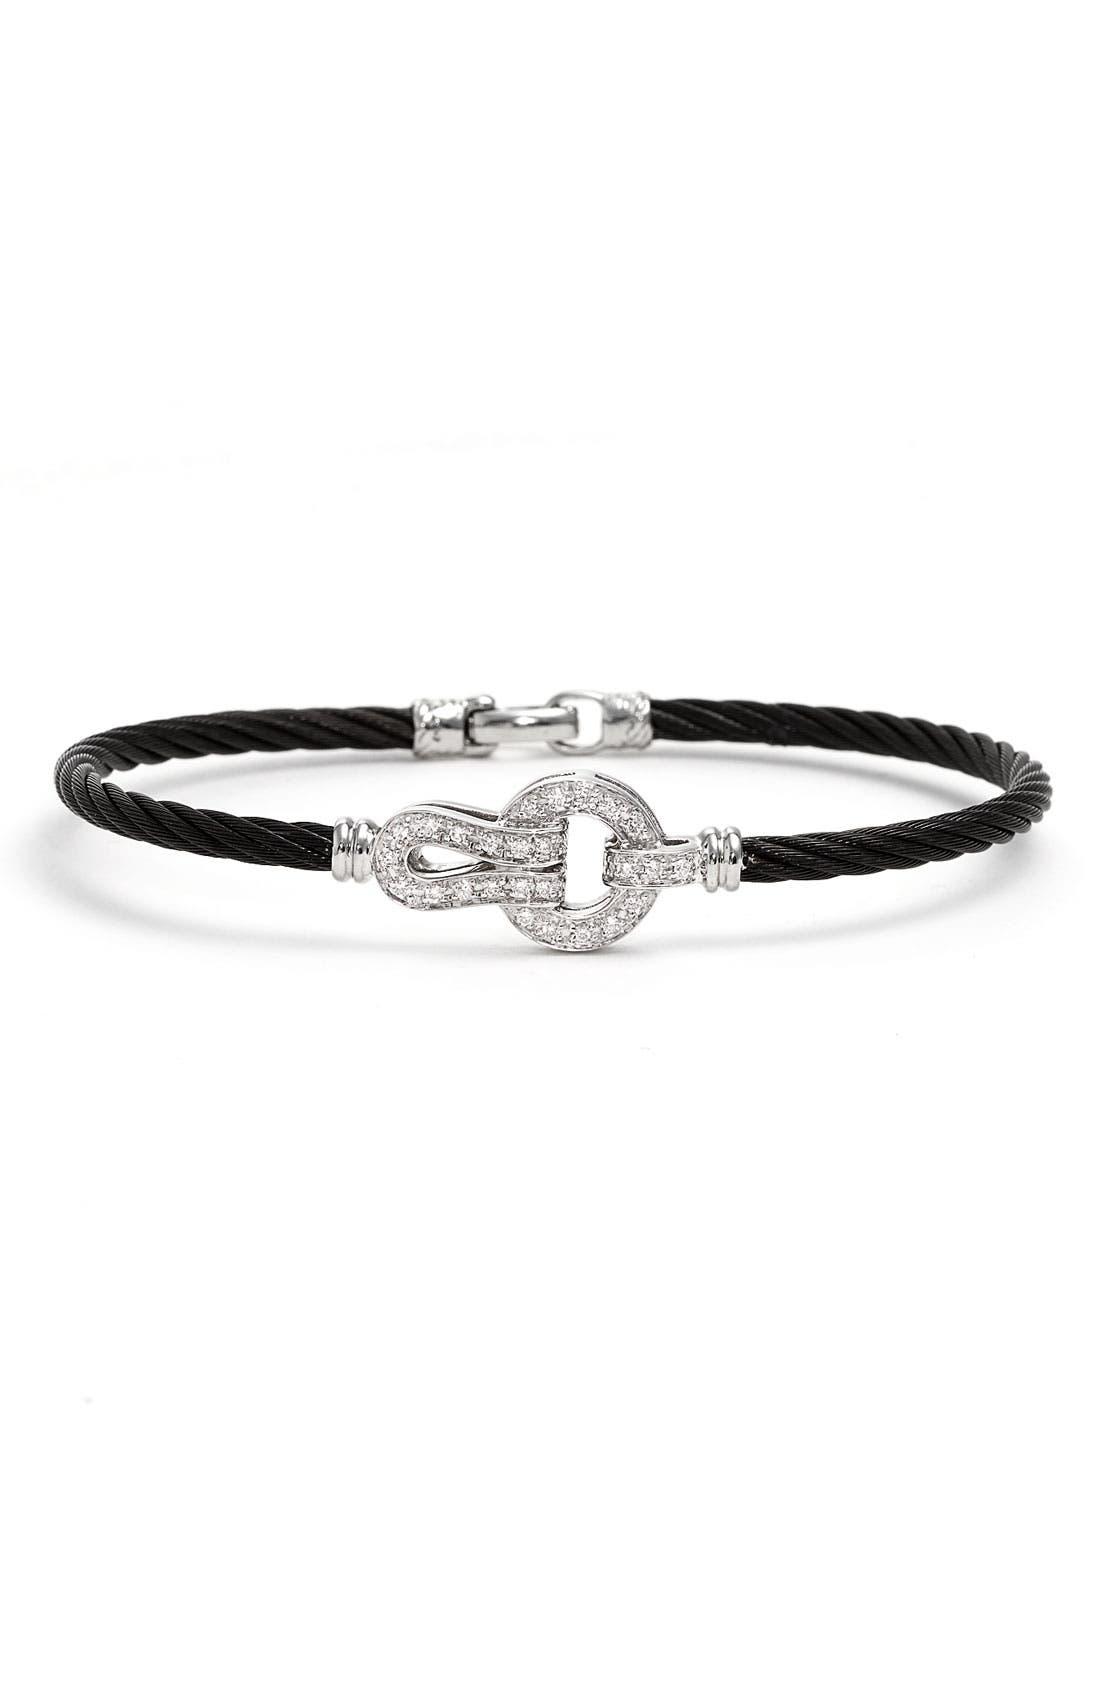 Alternate Image 1 Selected - ALOR® Circle Knot Diamond Bangle